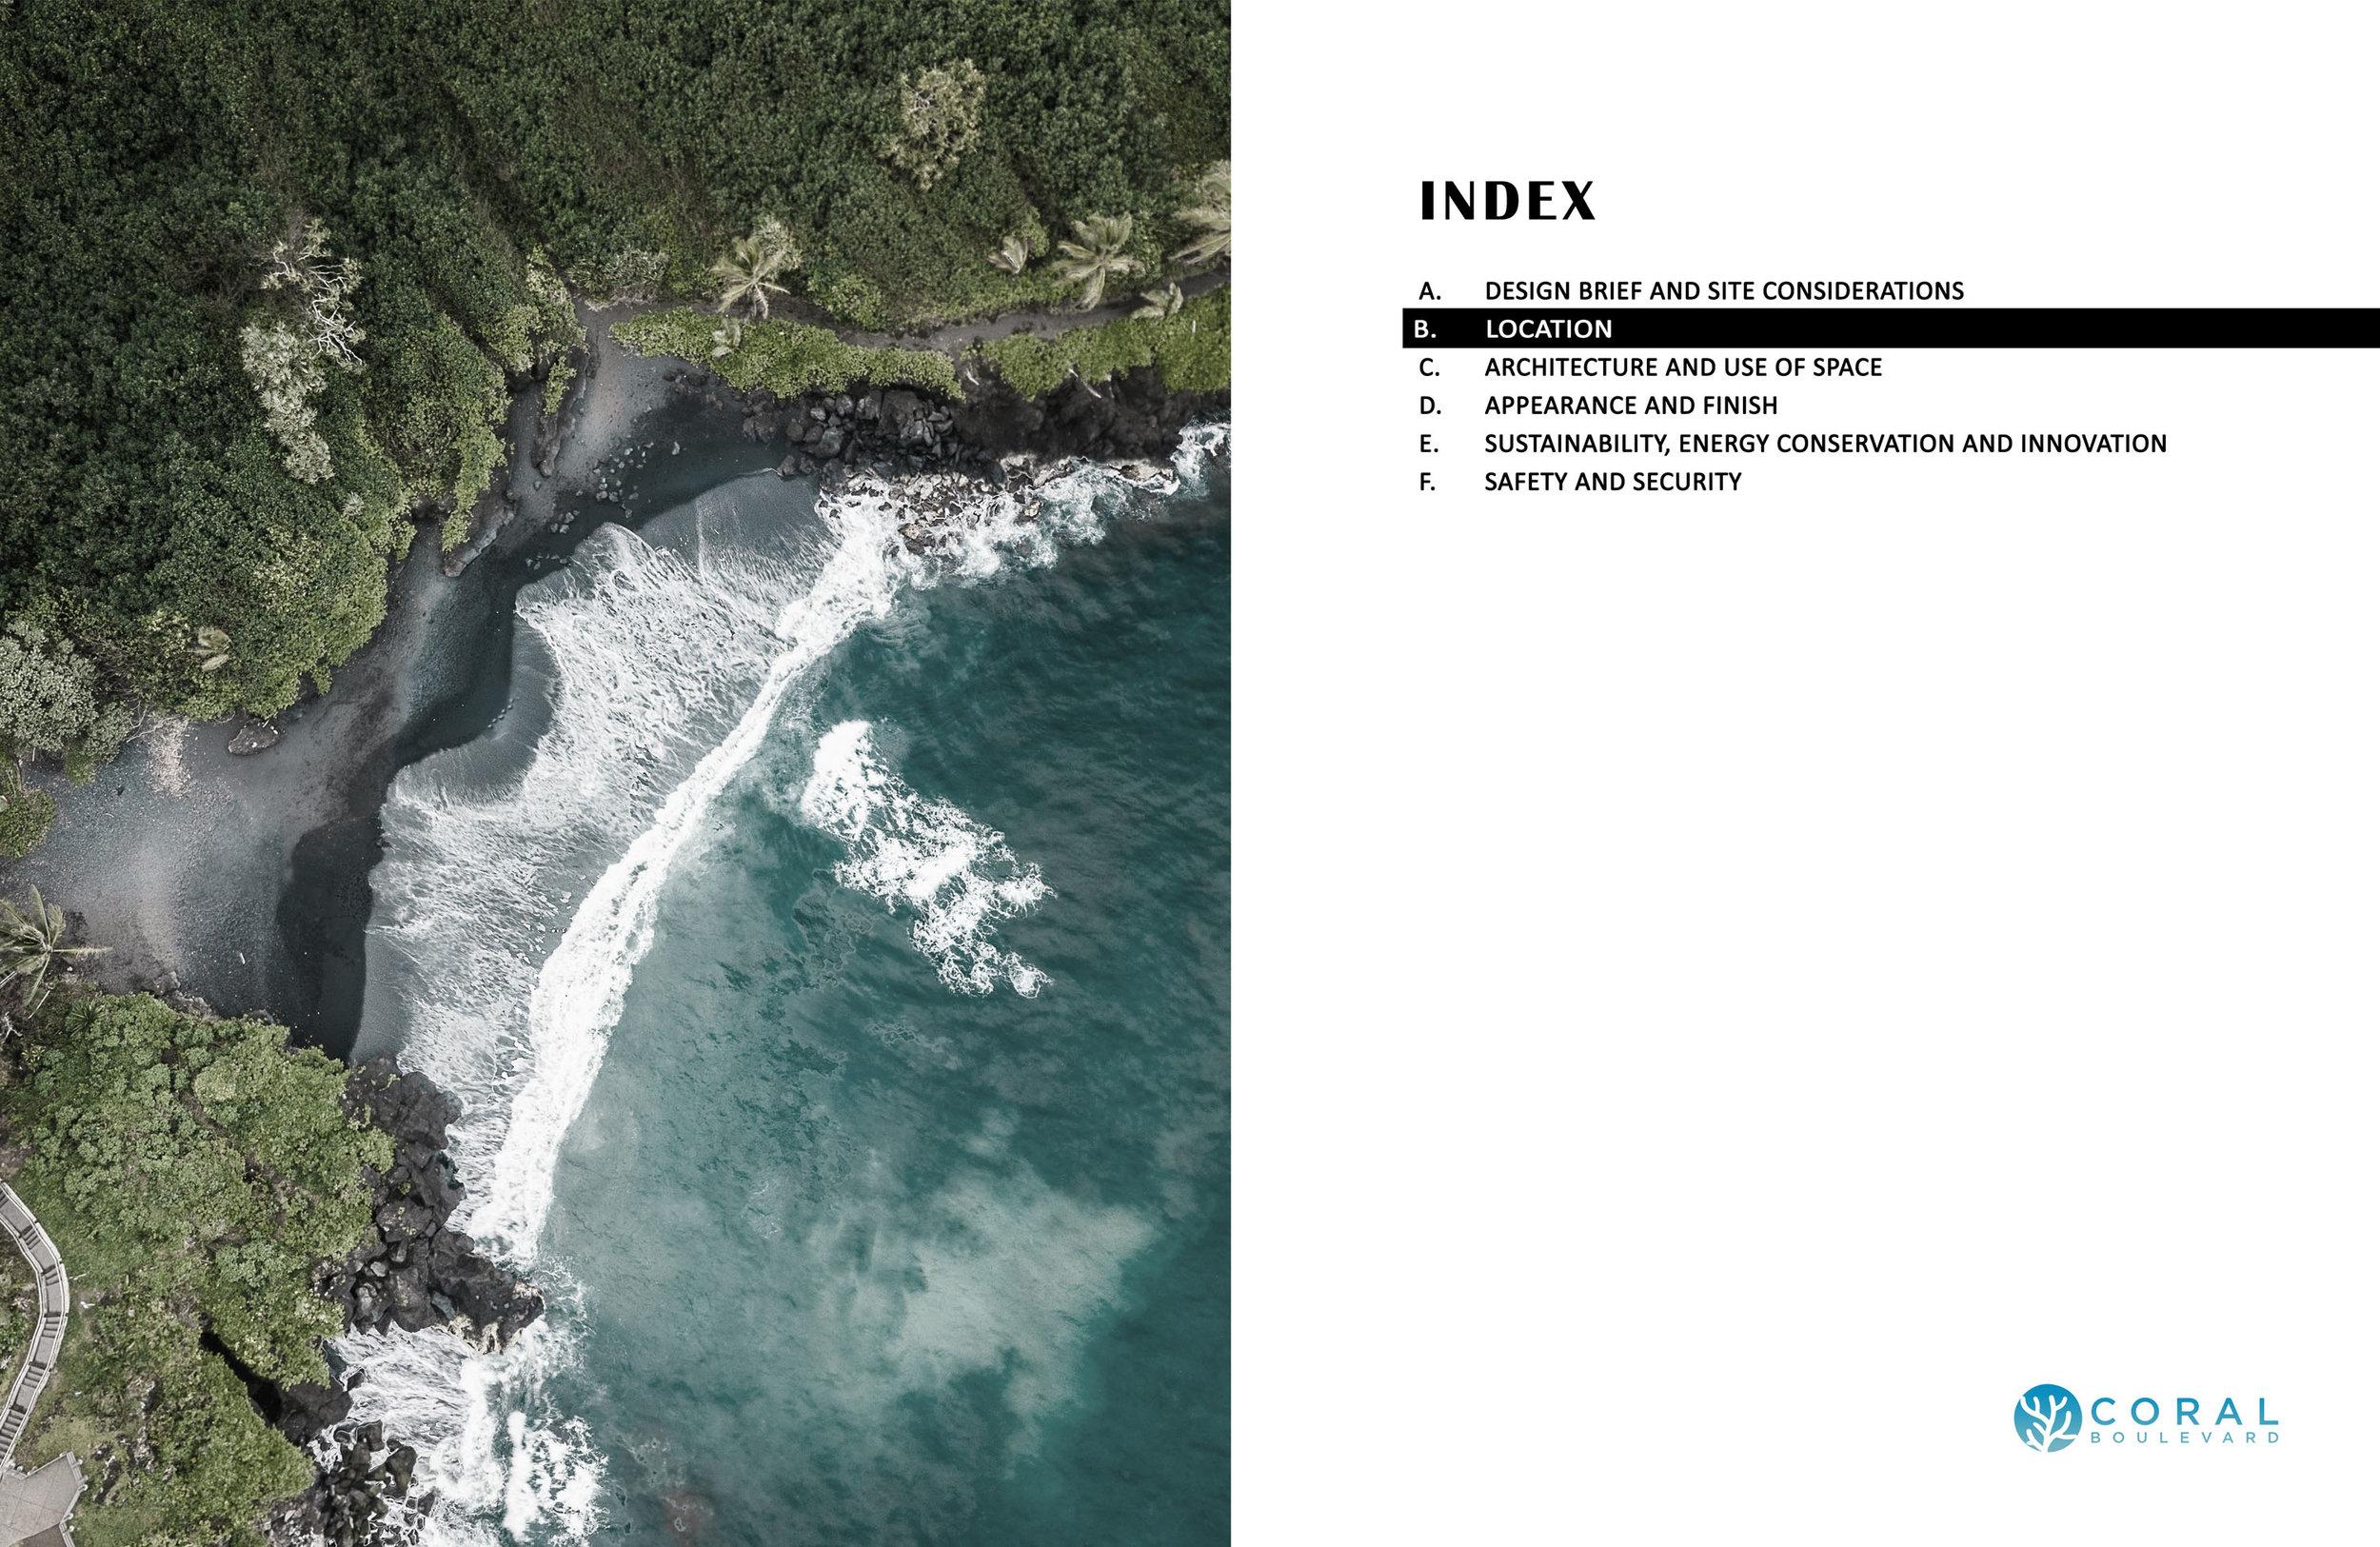 IPA_Coral Boulevard_pages_B-0B.jpg